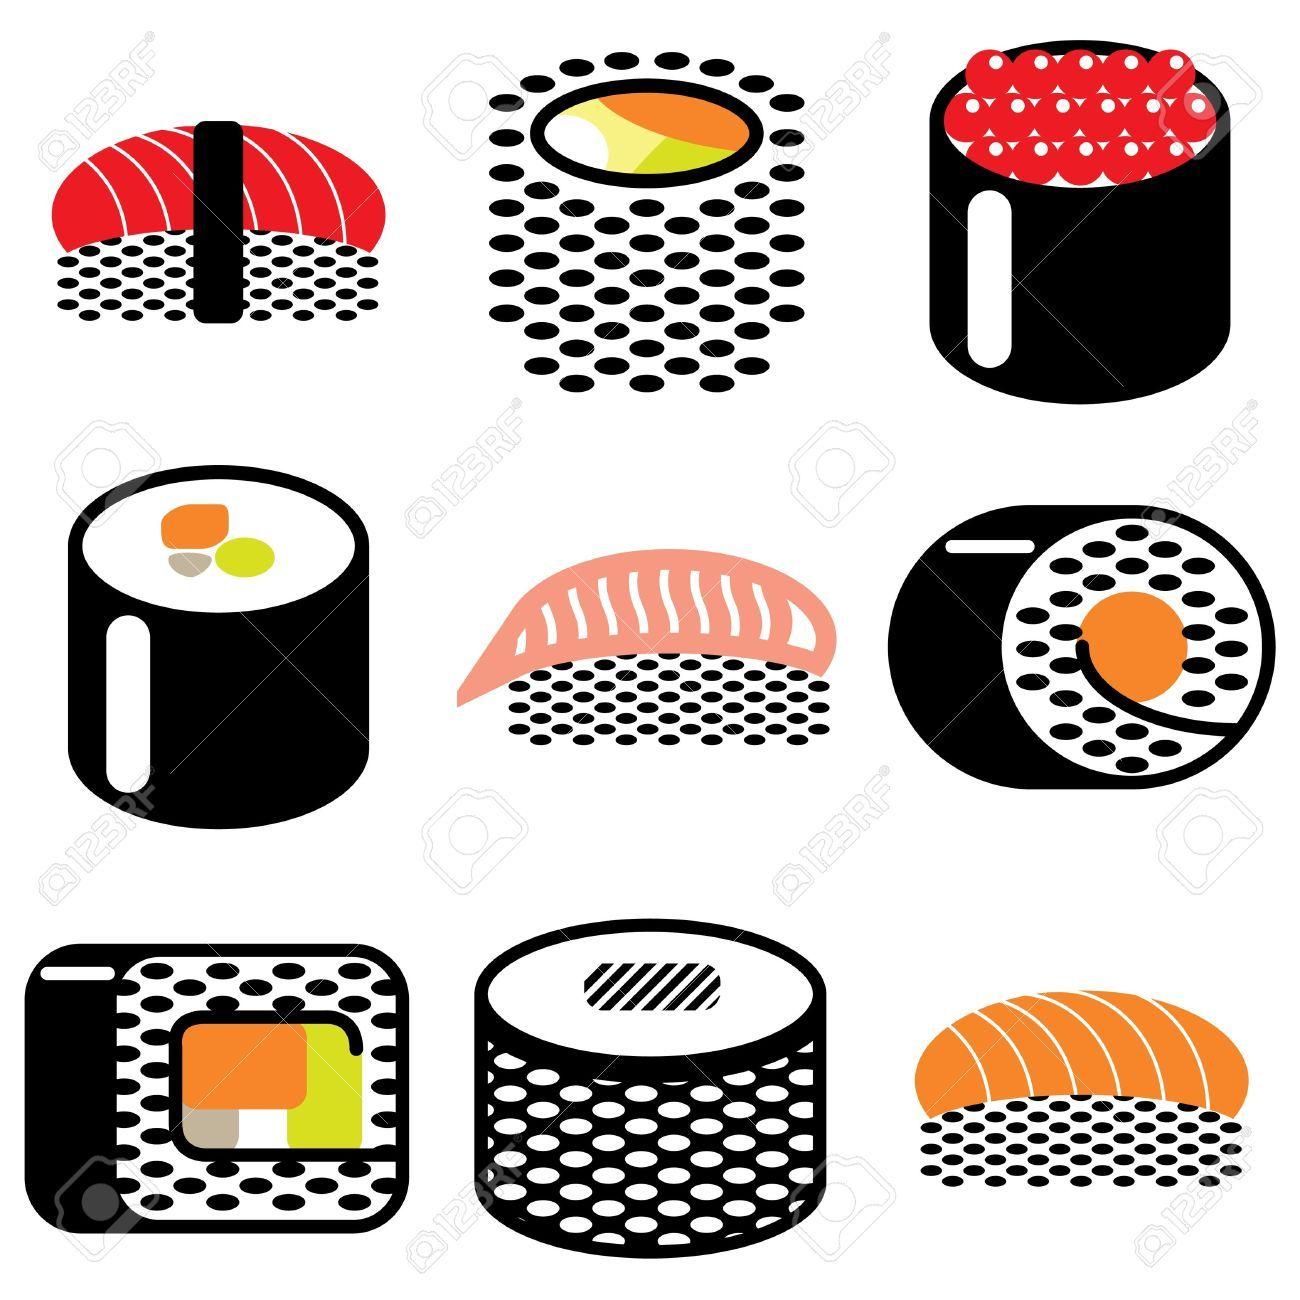 sushi vector Google Search Sushi rolls, Vector, Sushi